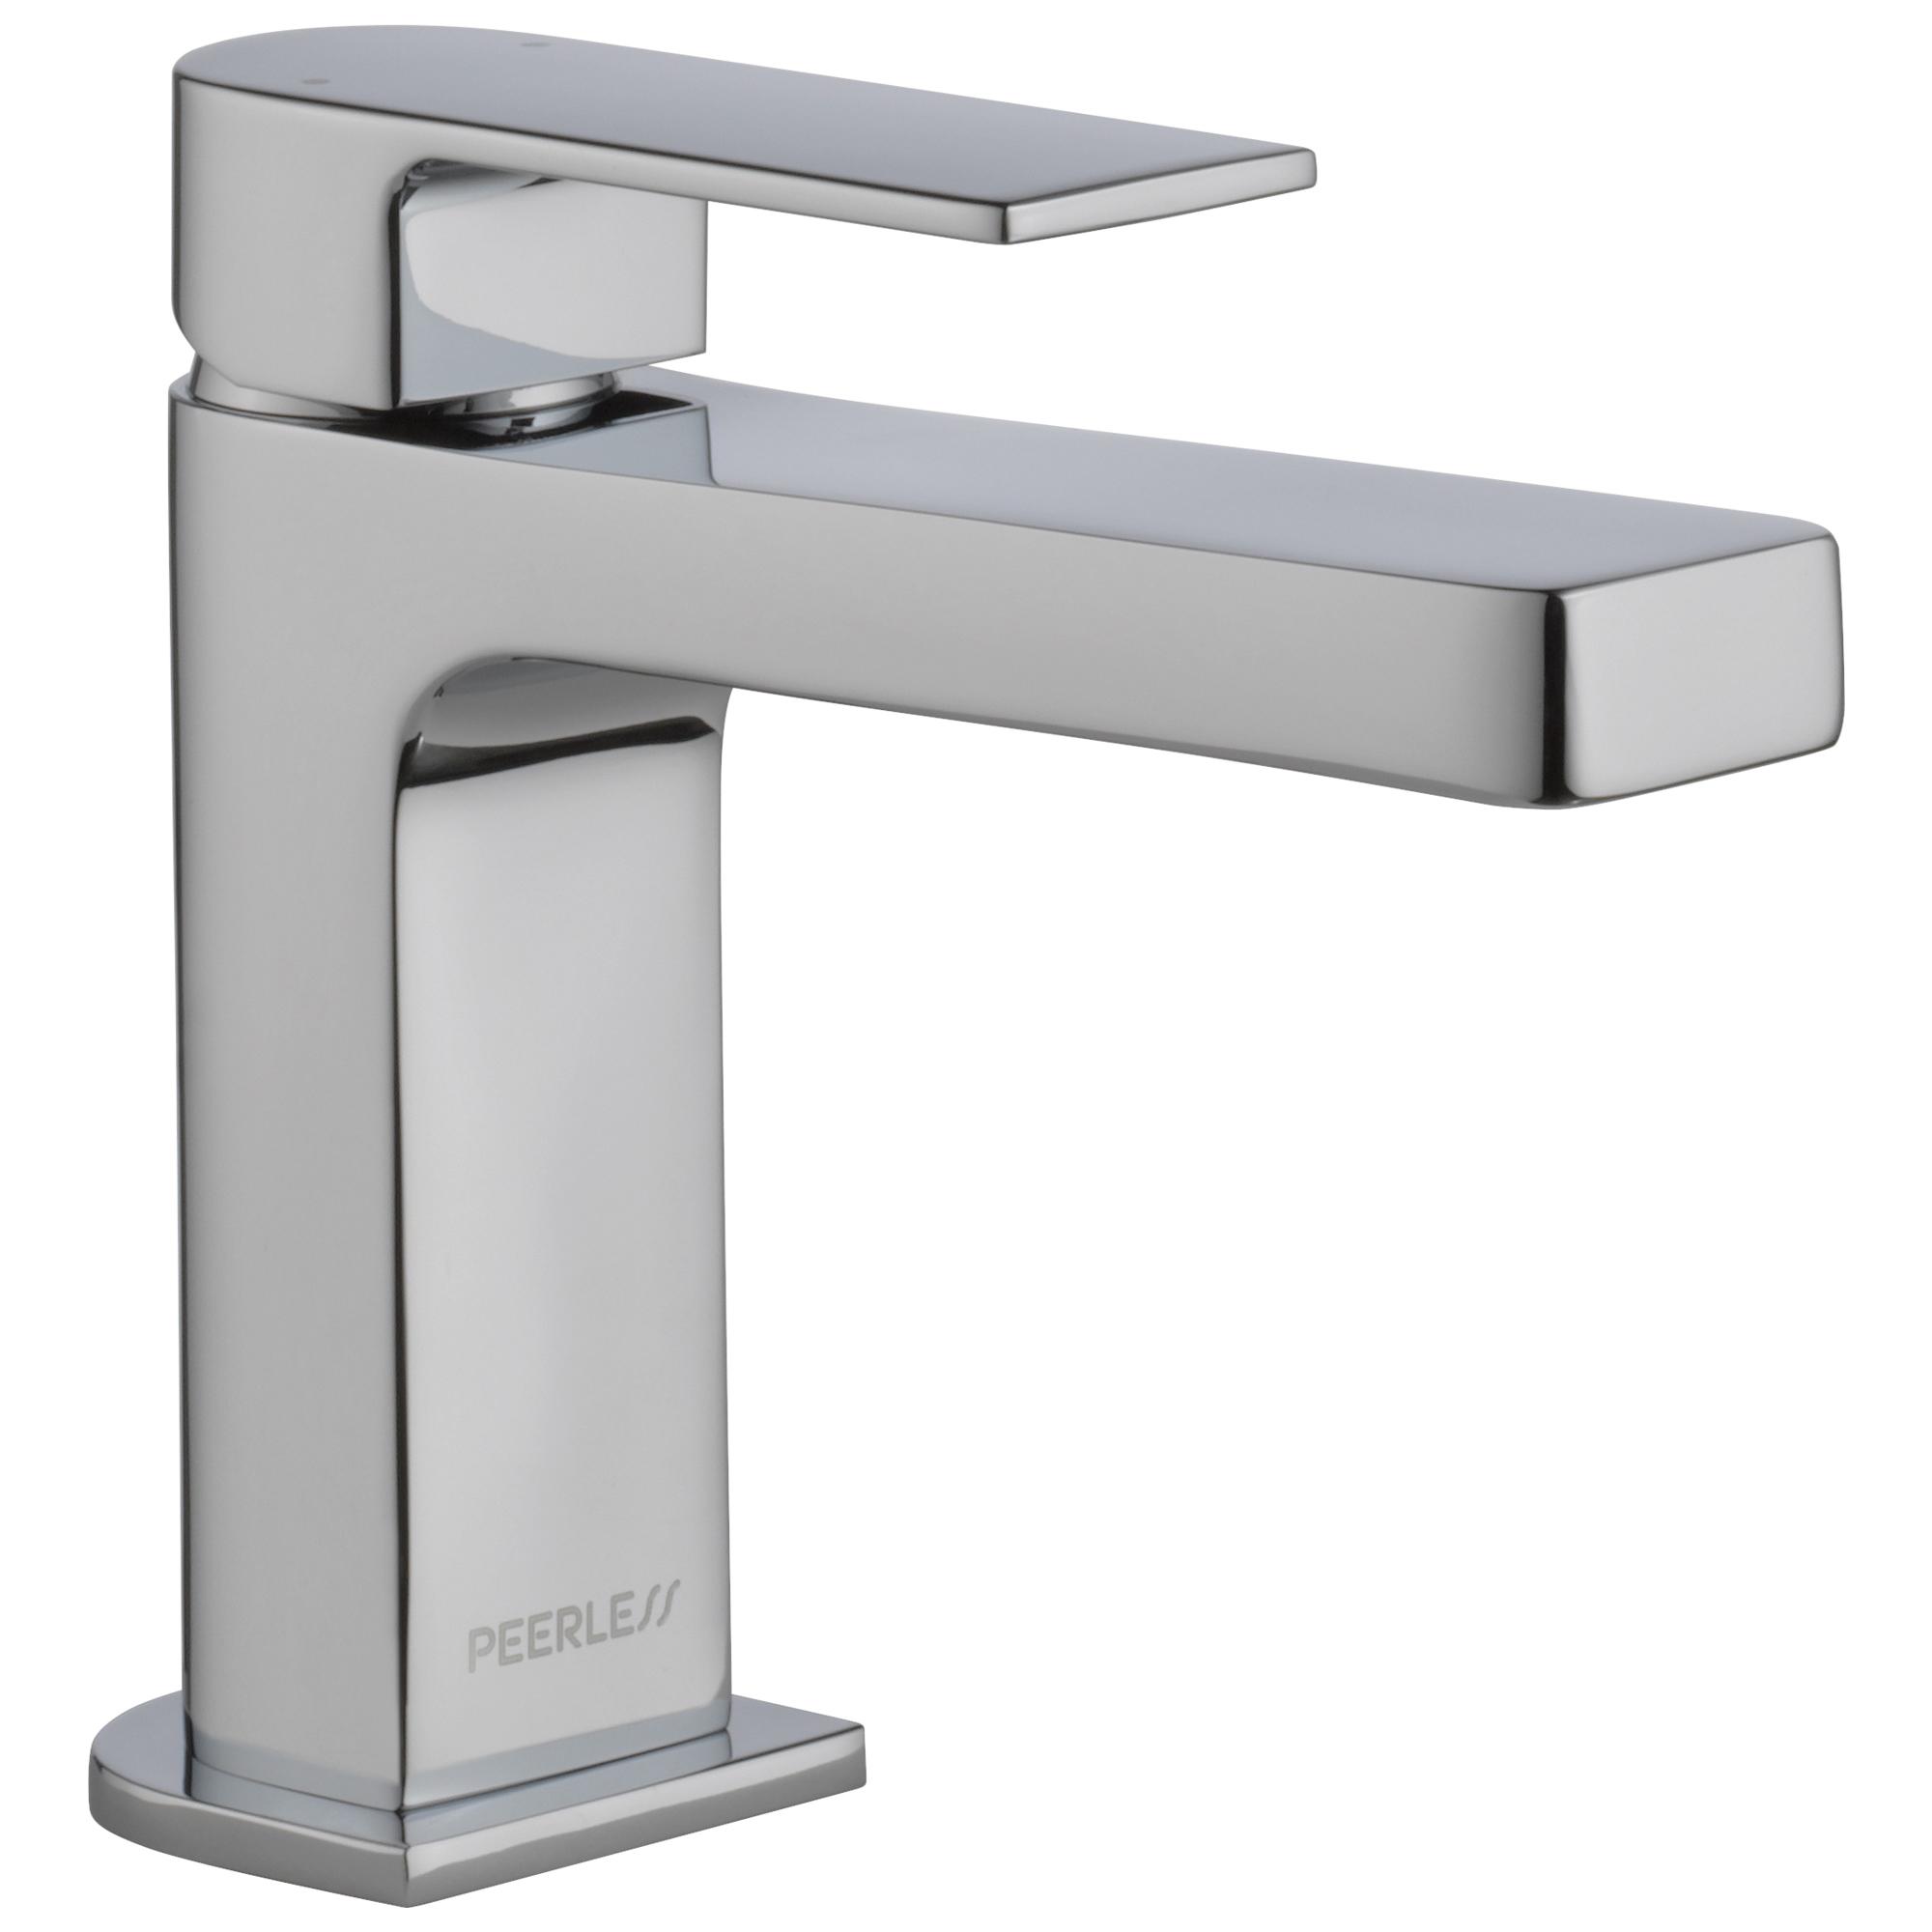 Peerless® P1519LF-LPU Bathroom Faucet, Xander™, Chrome Plated, 1 Handles, 1 gpm